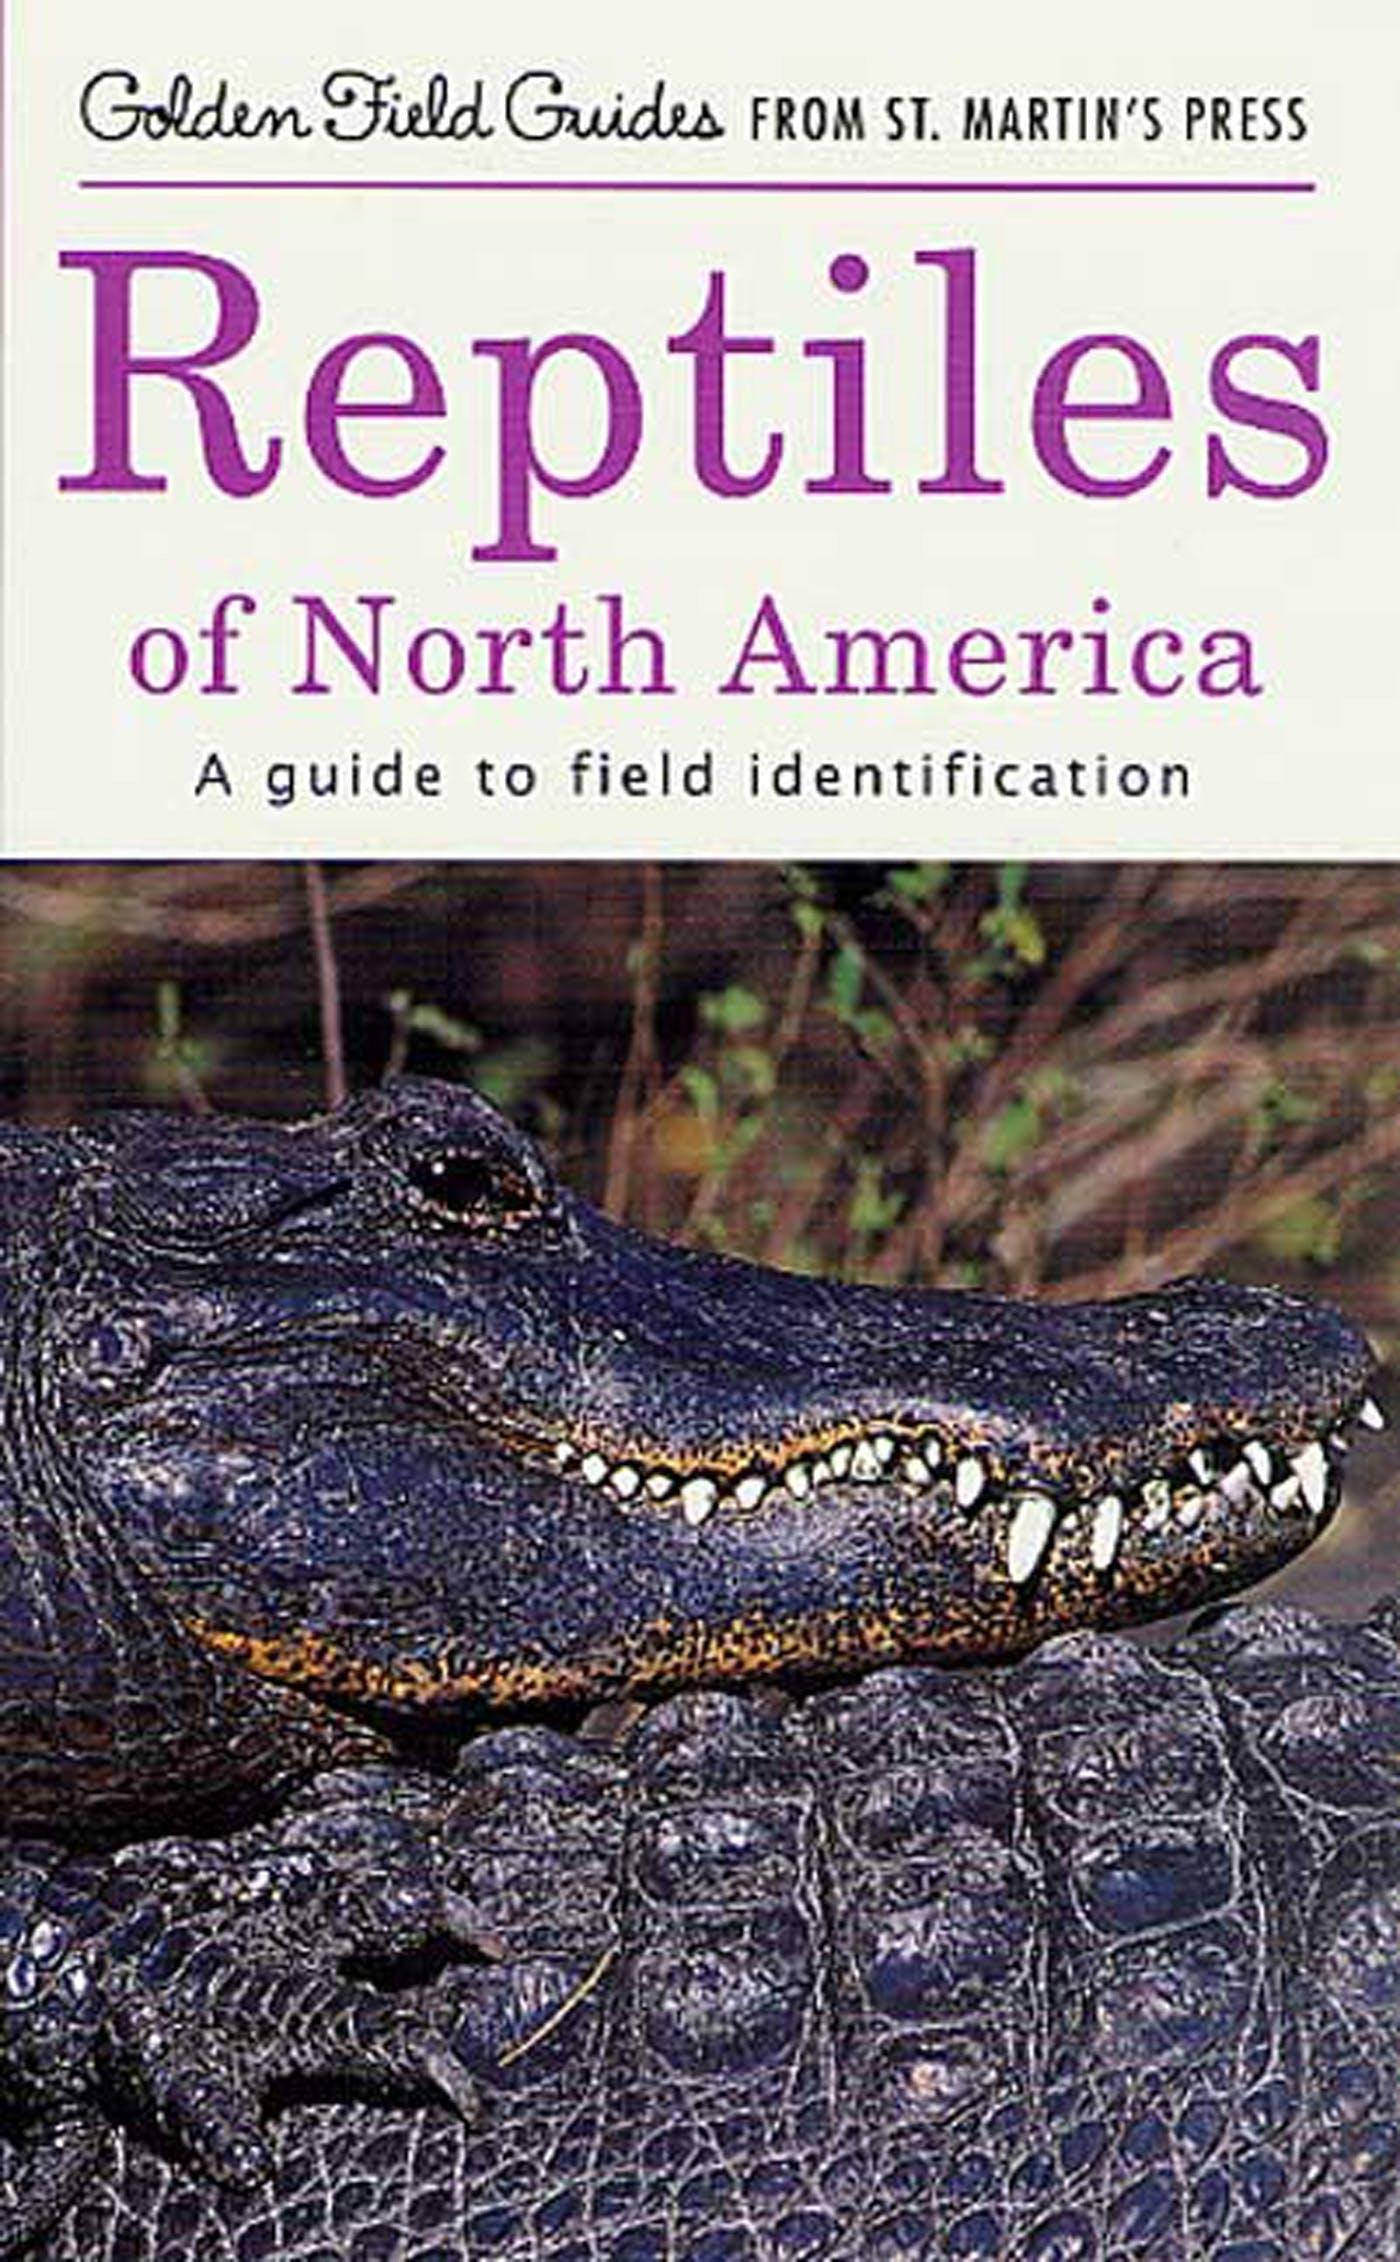 Image of Reptiles of North America